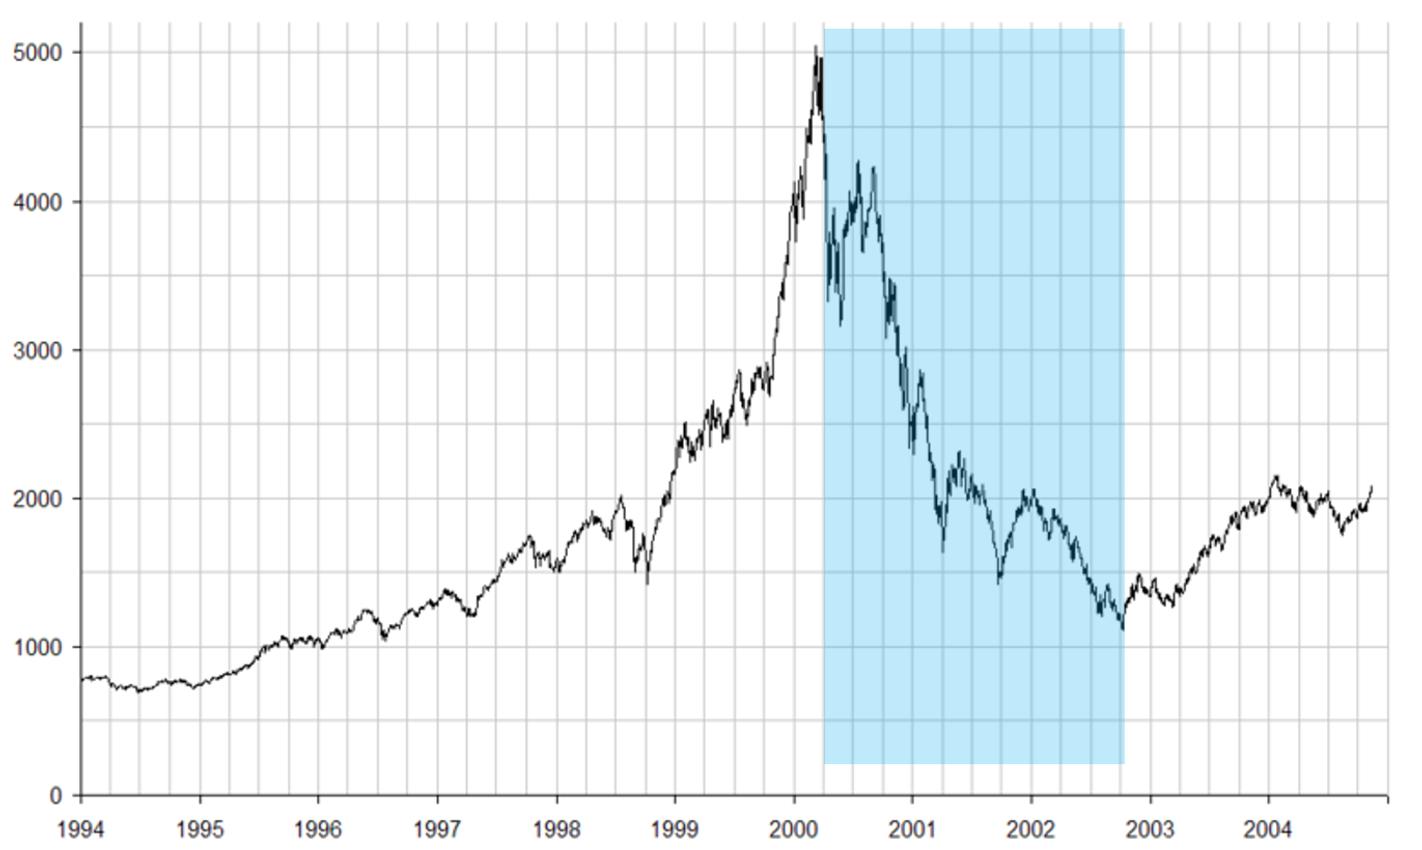 Le bear market de la bulle internet